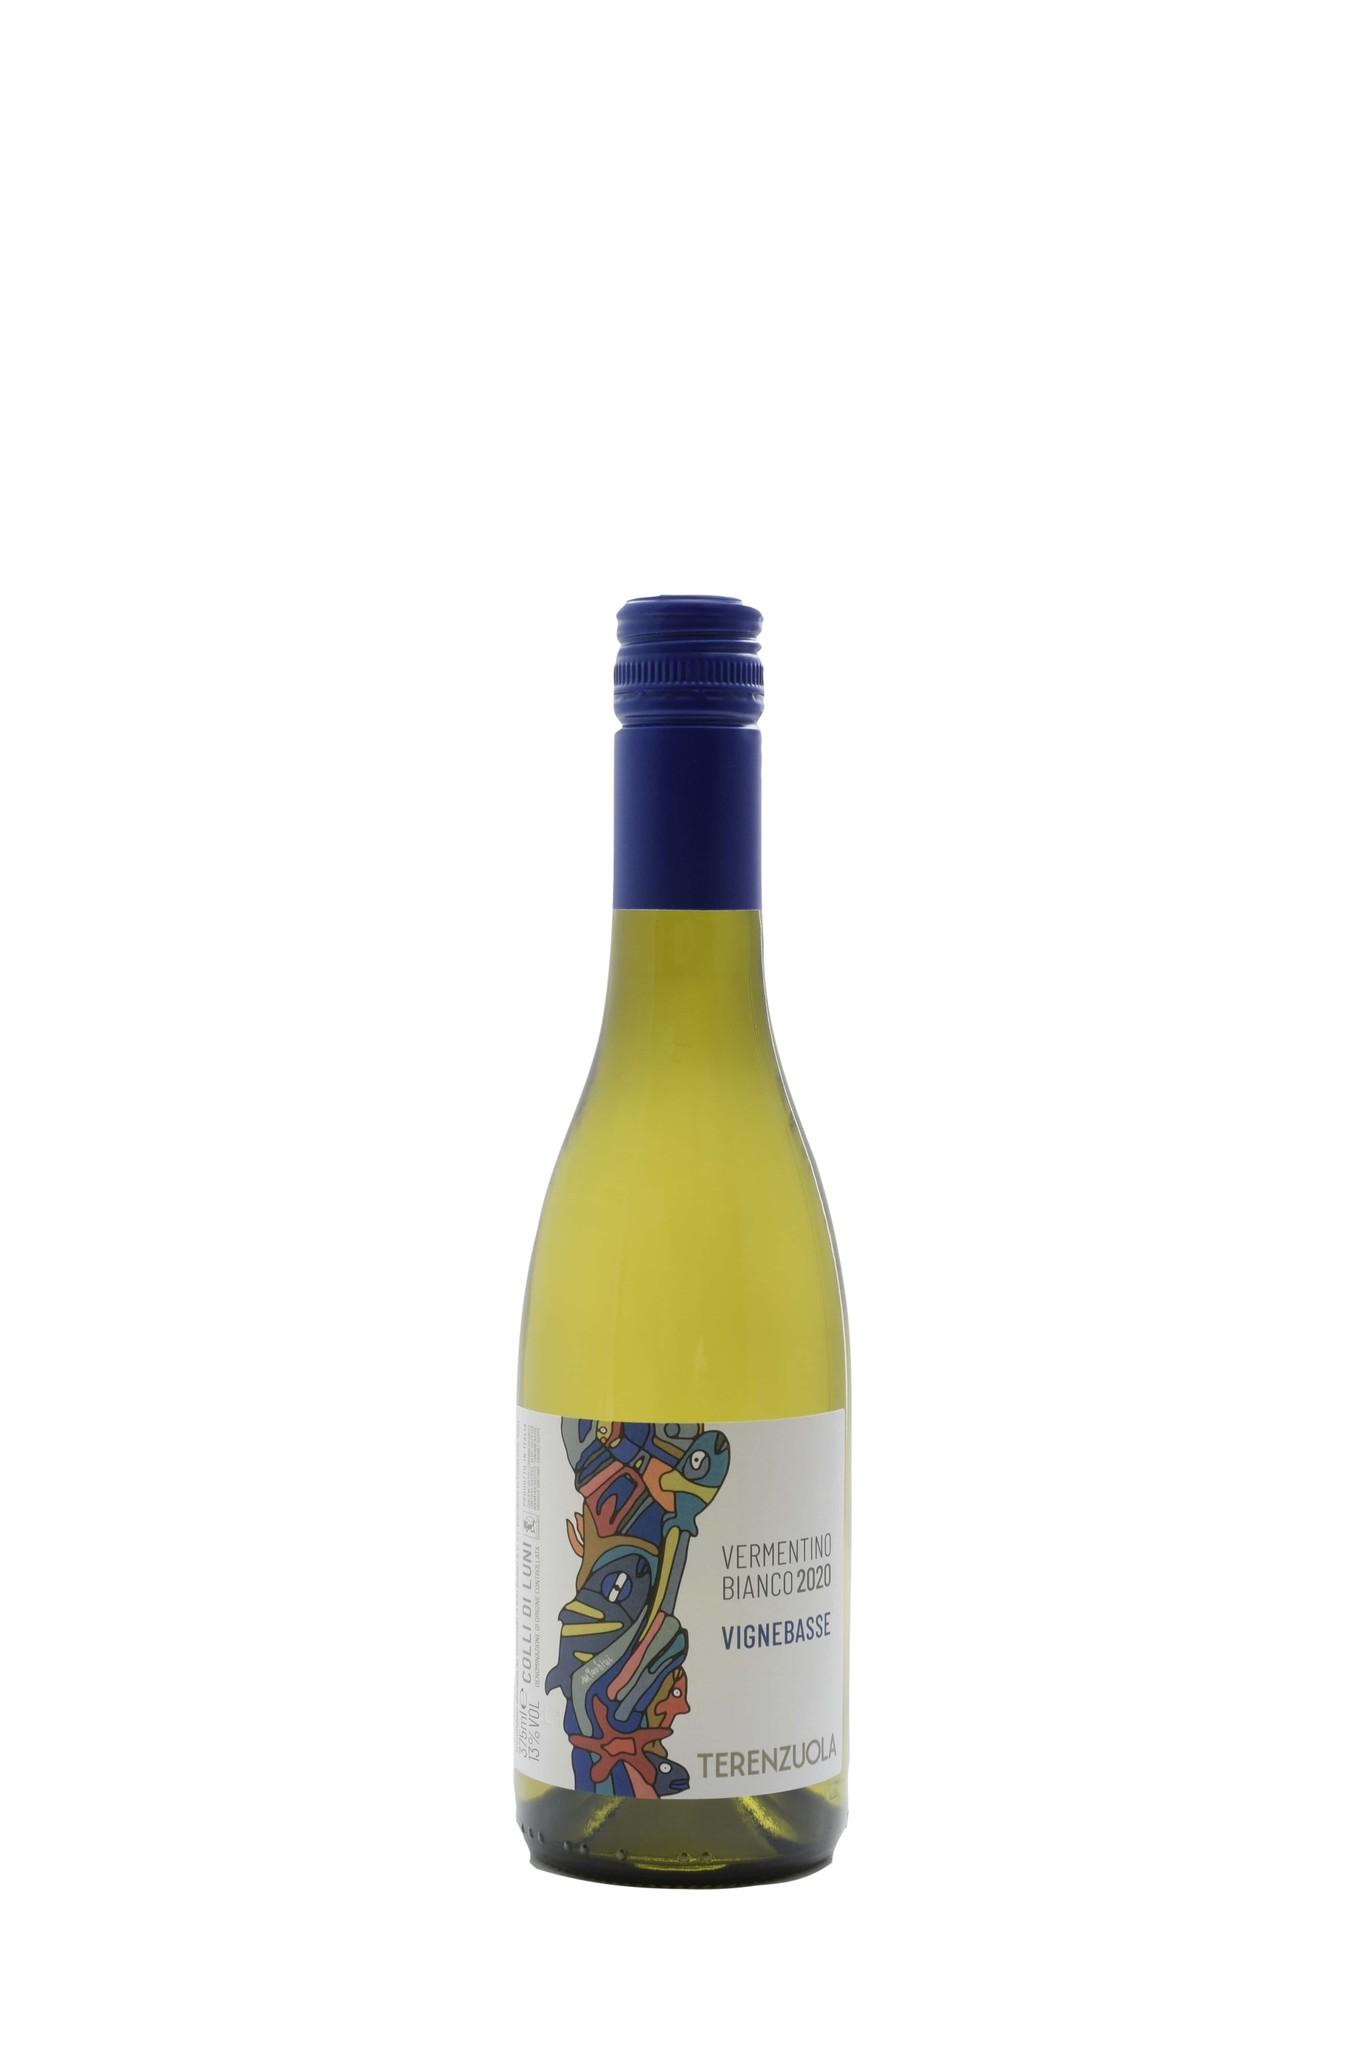 Vermentino Vigne Basse 2020 37,5cl-1